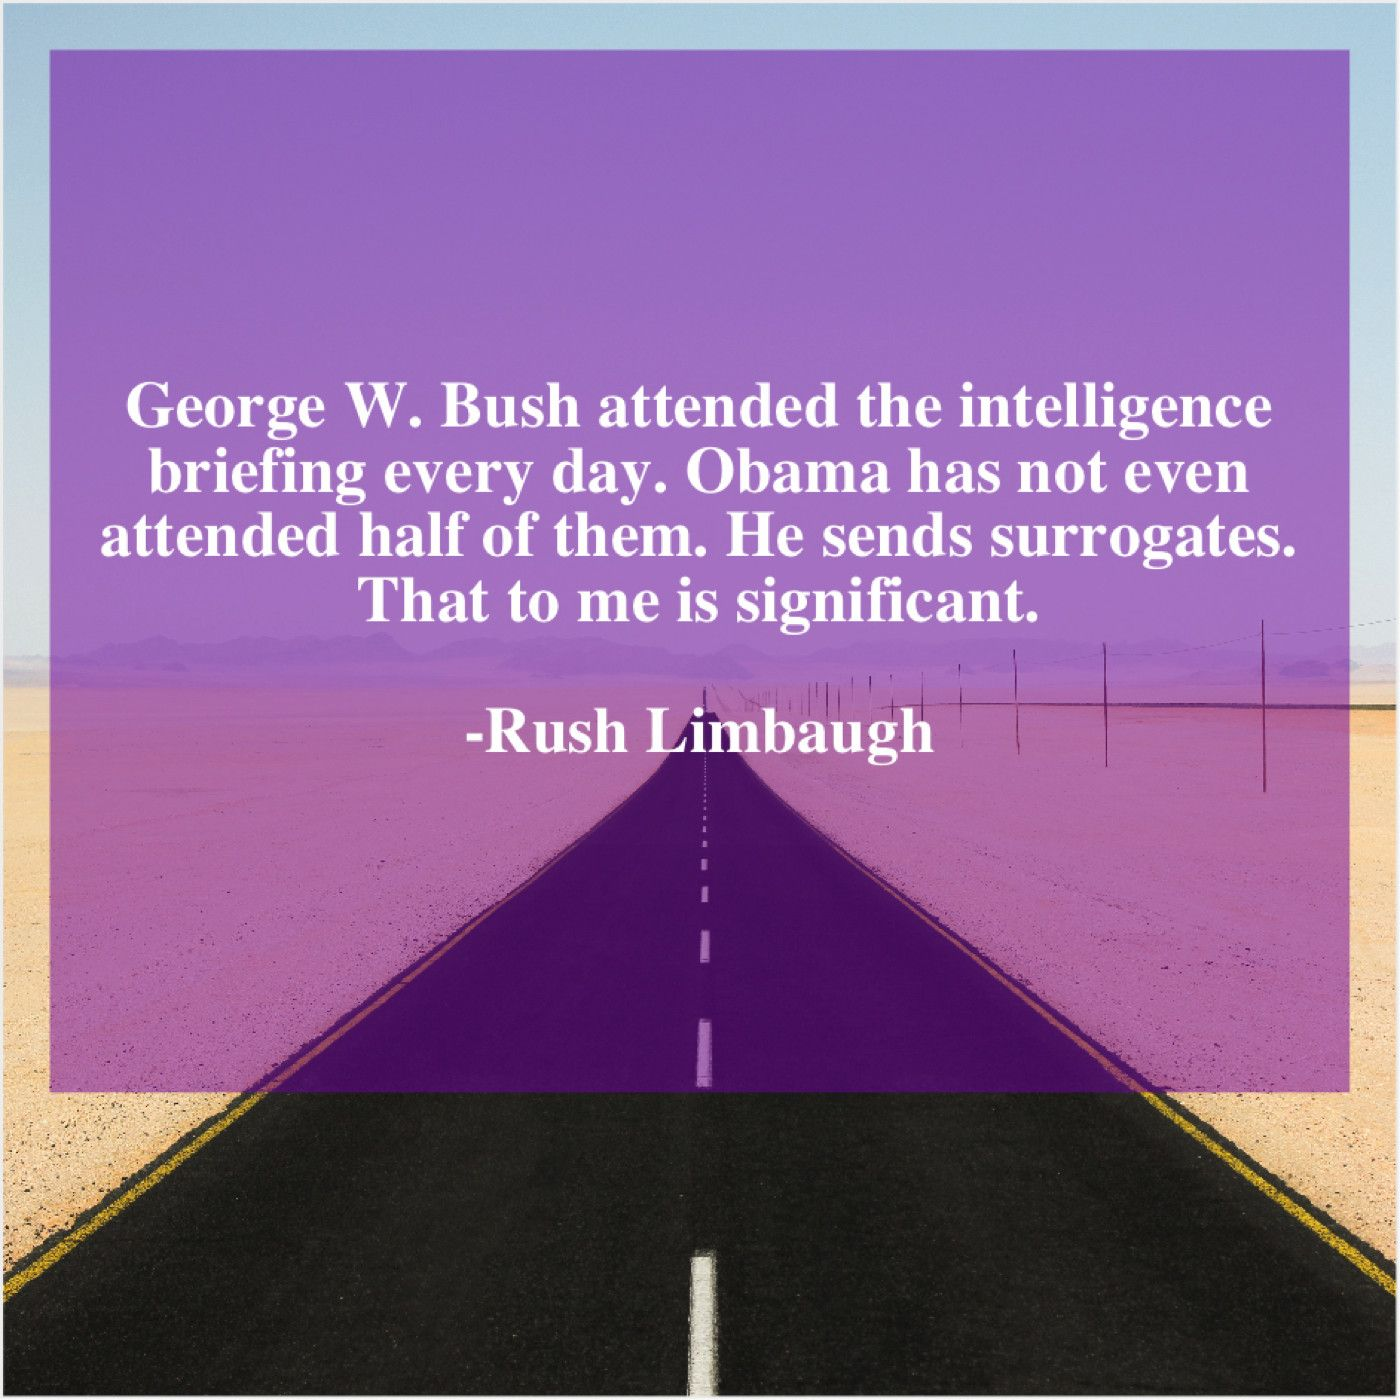 Rush Limbaugh George W Bush Attended The Jane Pauley Imran Khan David Cassidy